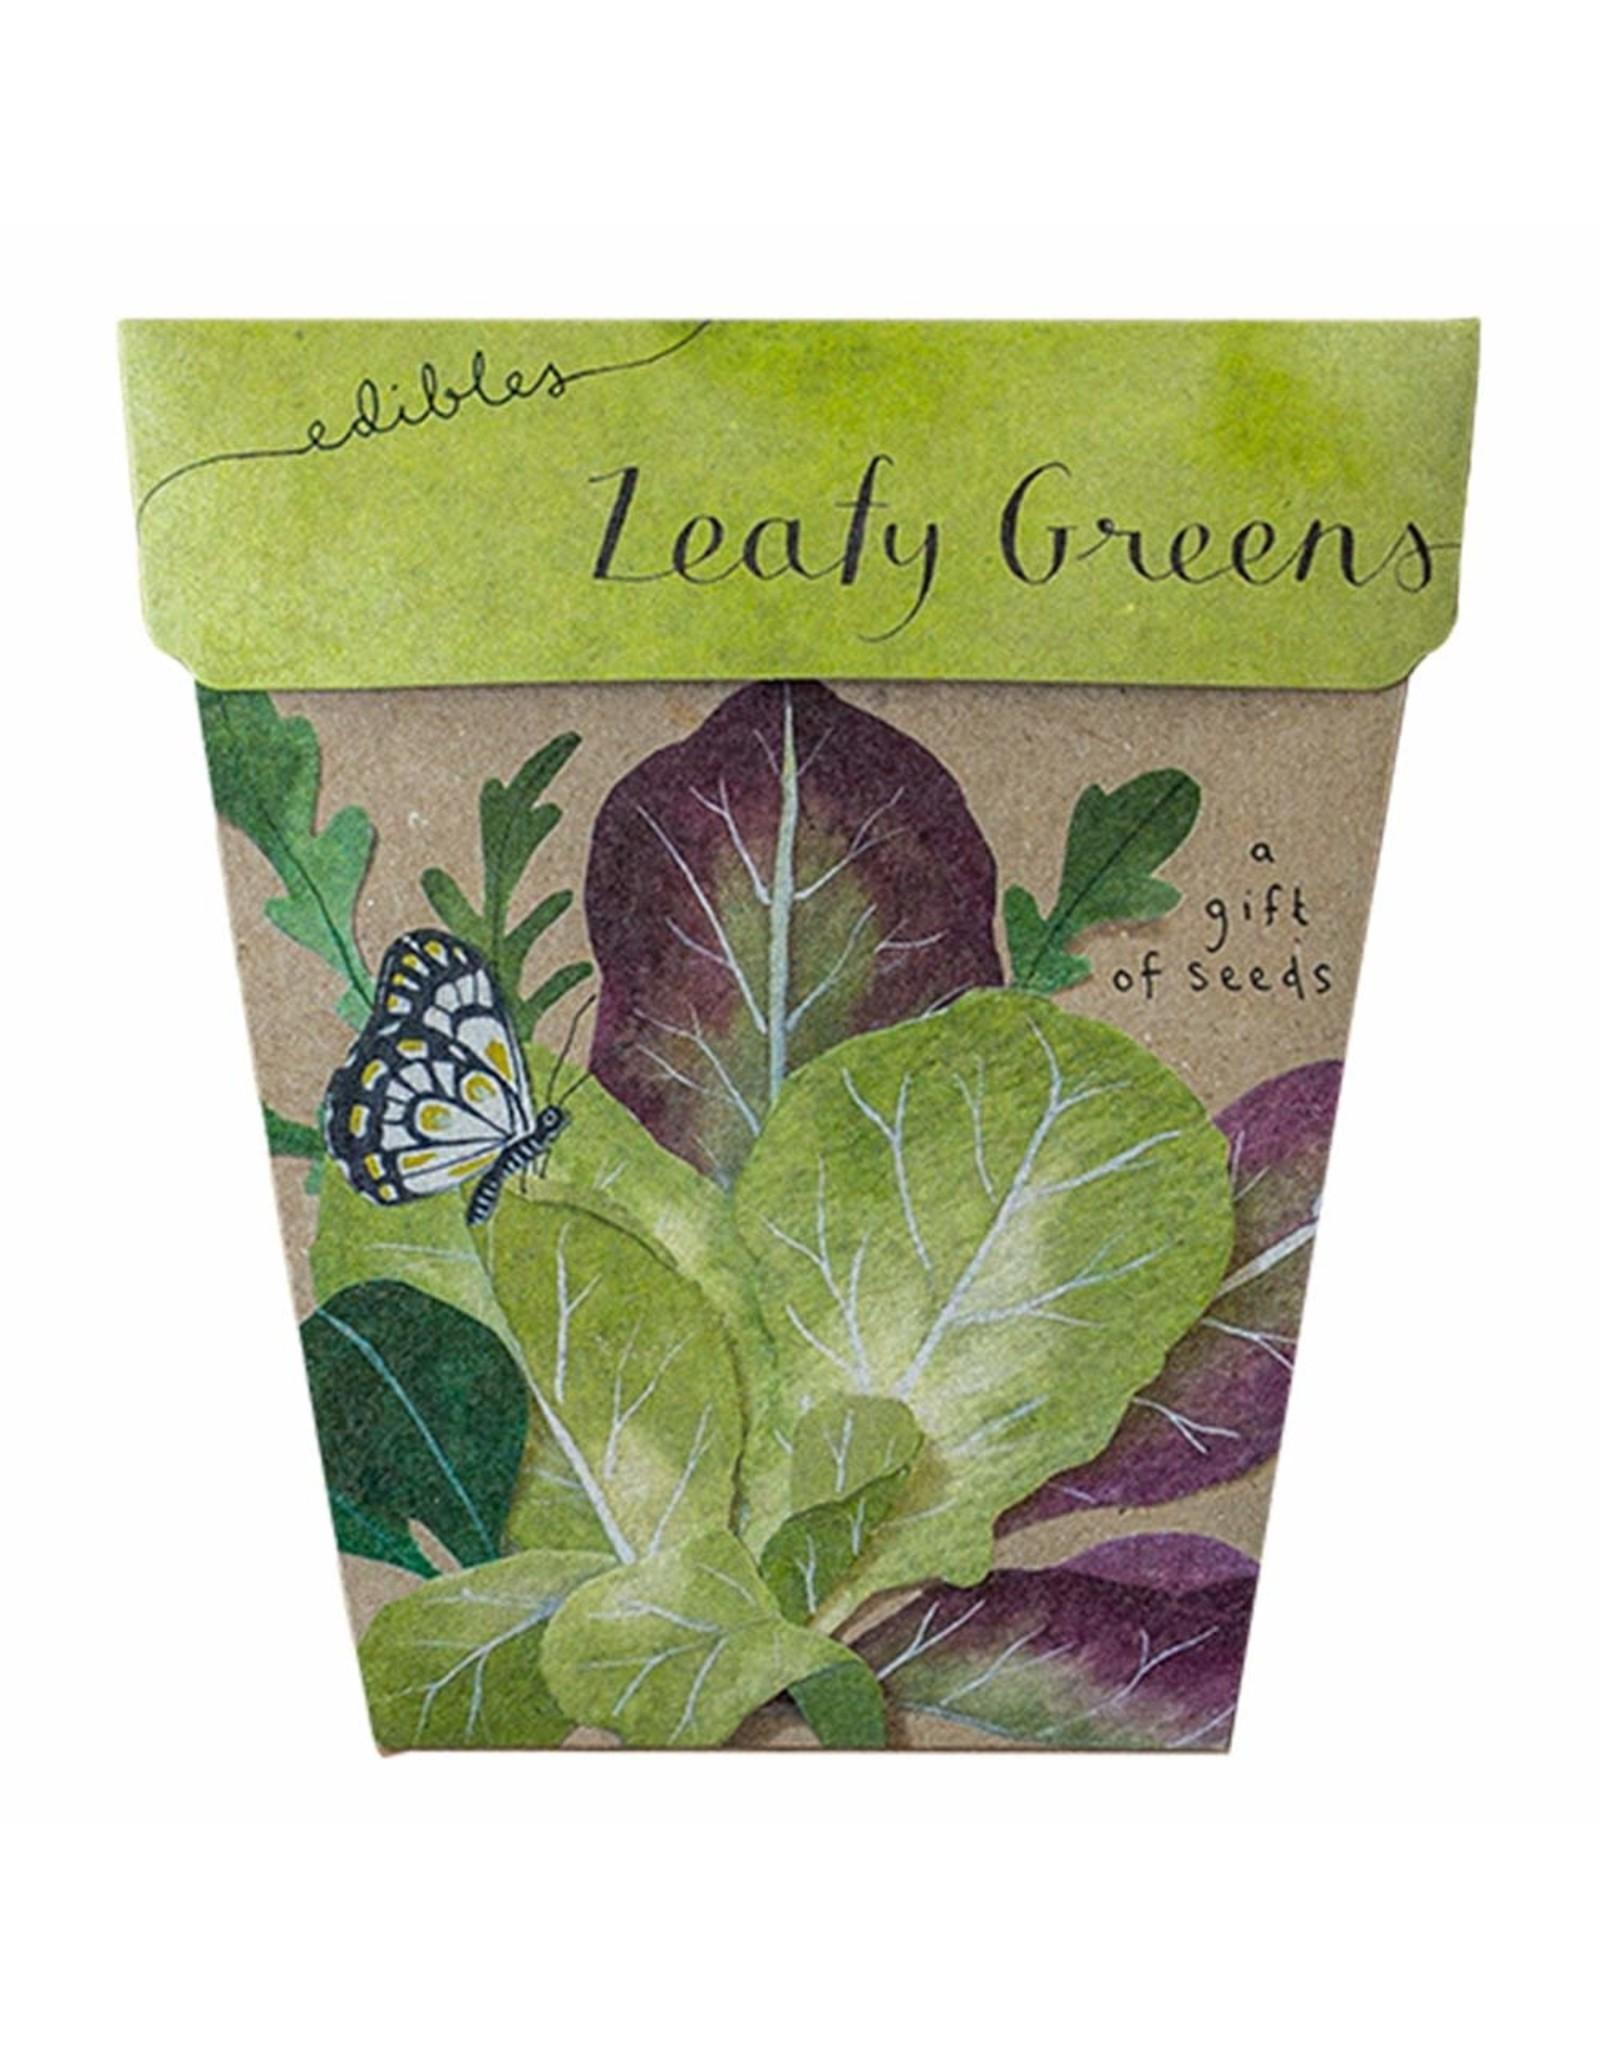 Sow 'N Sow Gift of Seeds - Leafy Greens